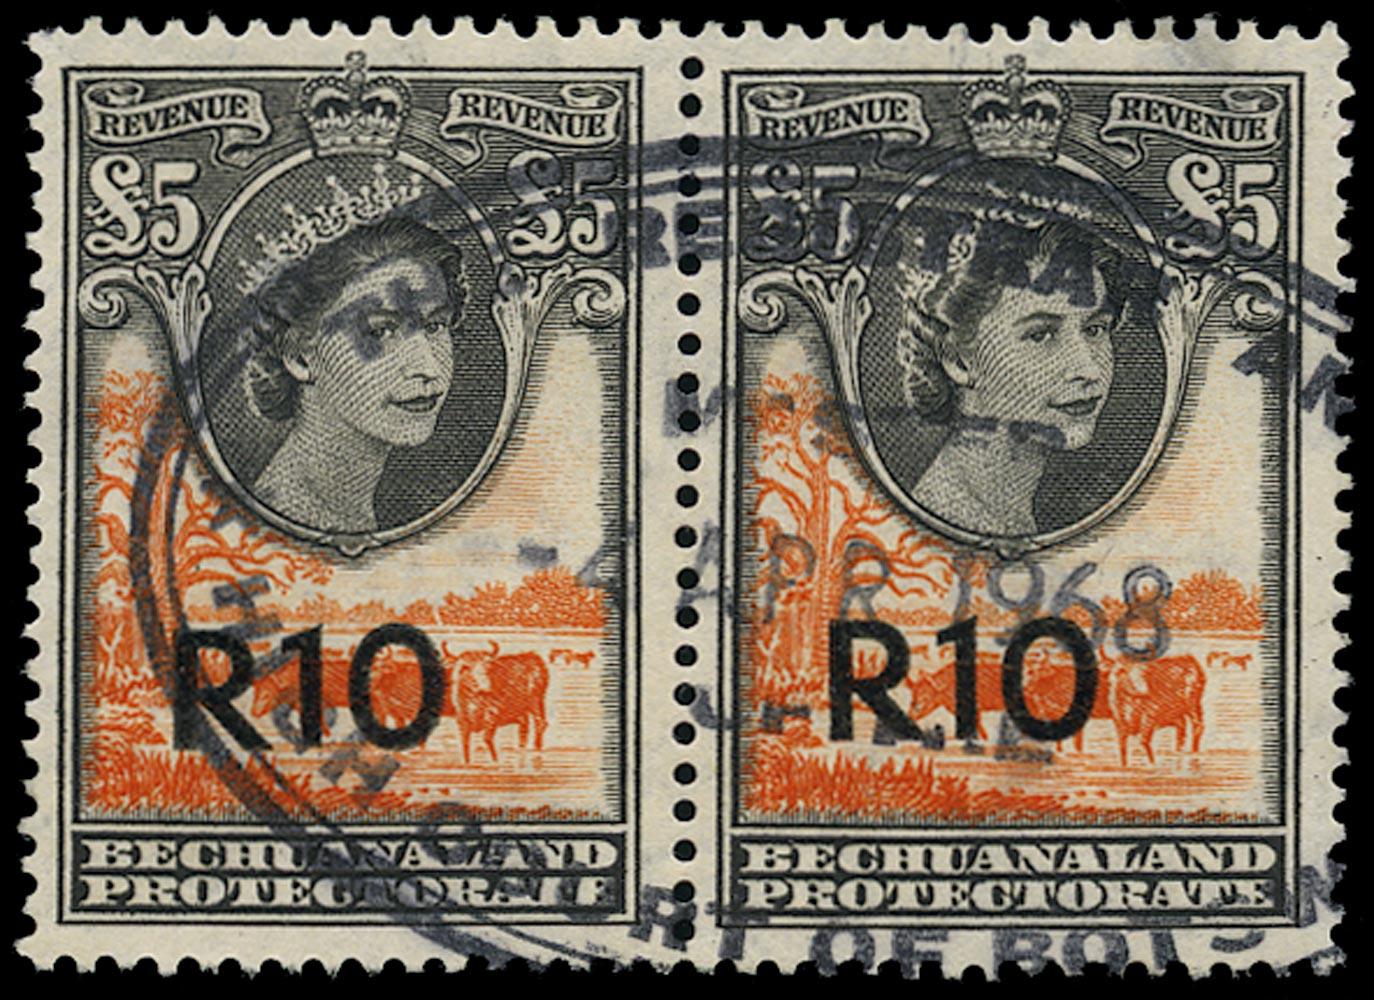 BECHUANALAND 1961 Revenue 'R10' on £5 orange-red used